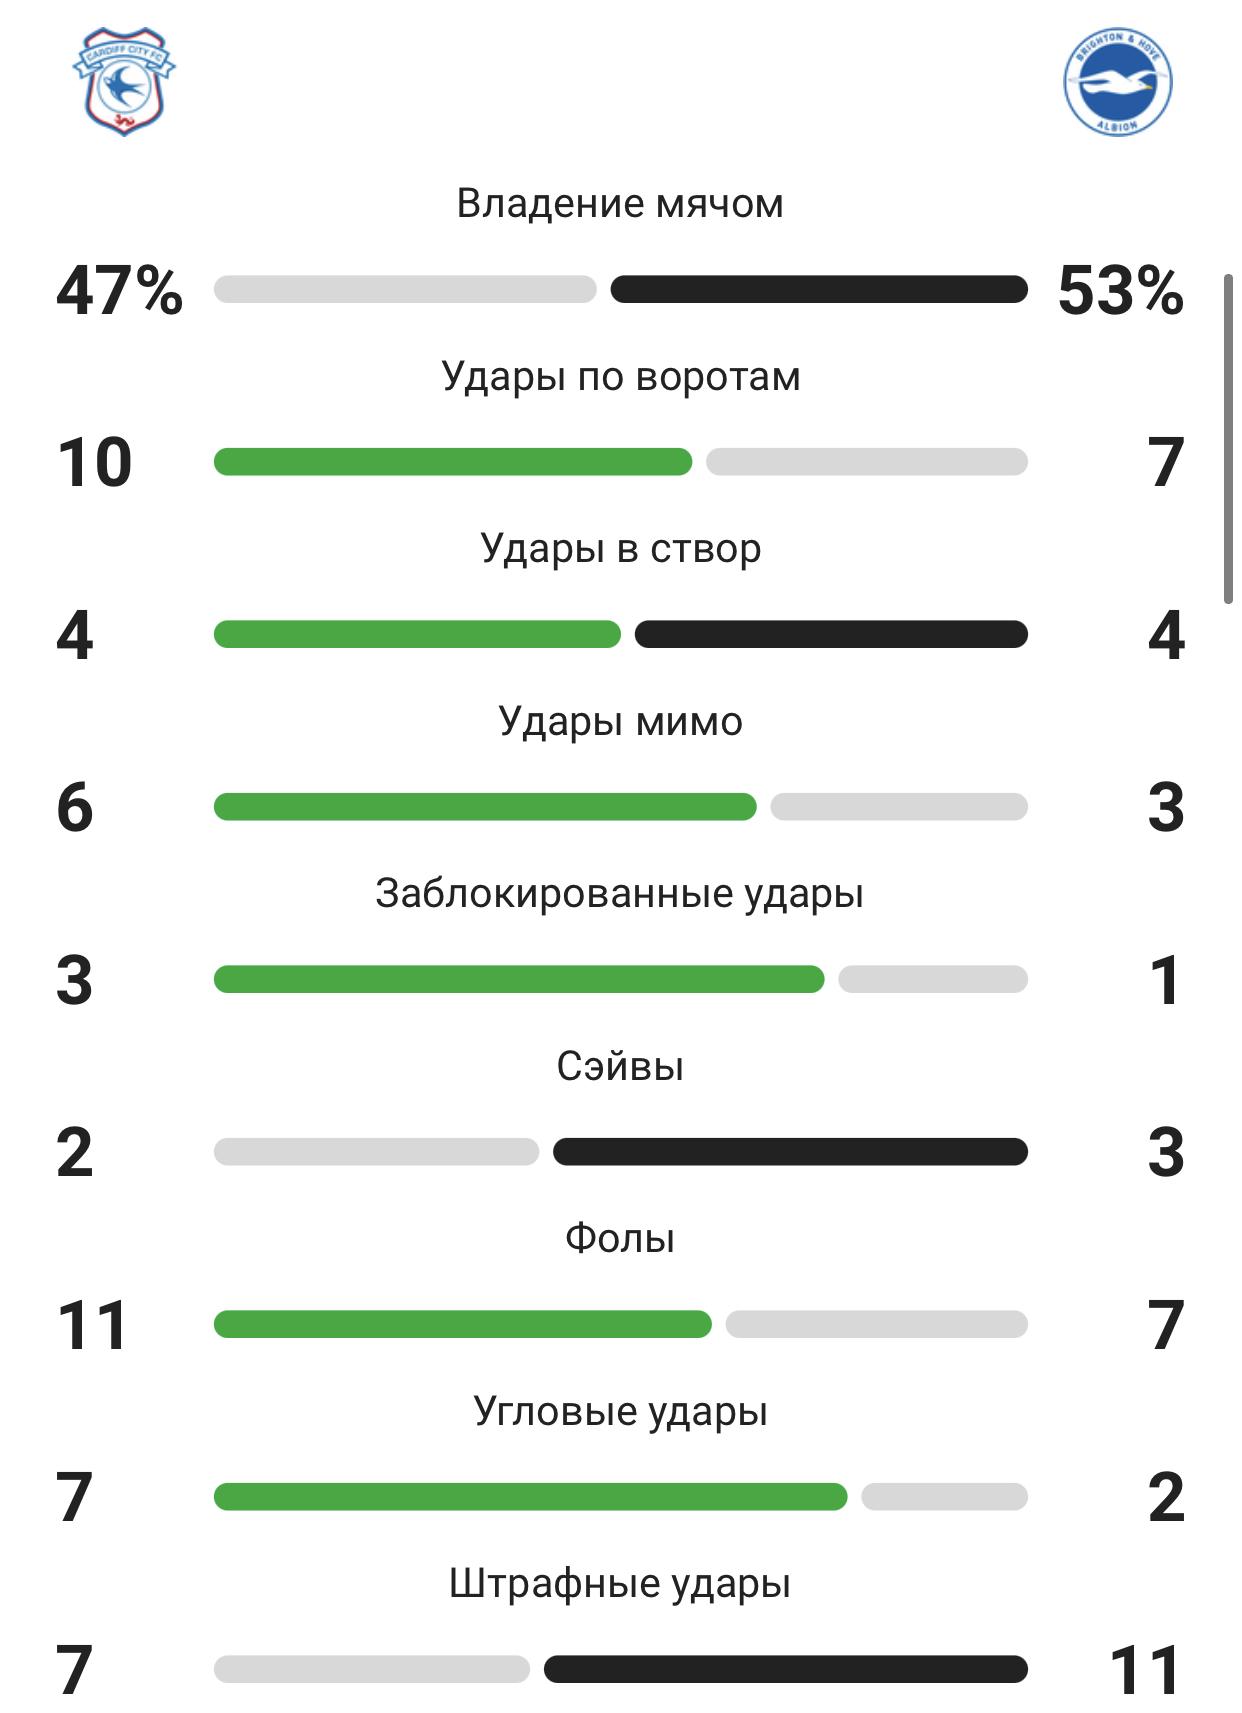 Итоги матча с «Кардиффом»: ассист Мвепу, гол Модера и талатливый Зекири